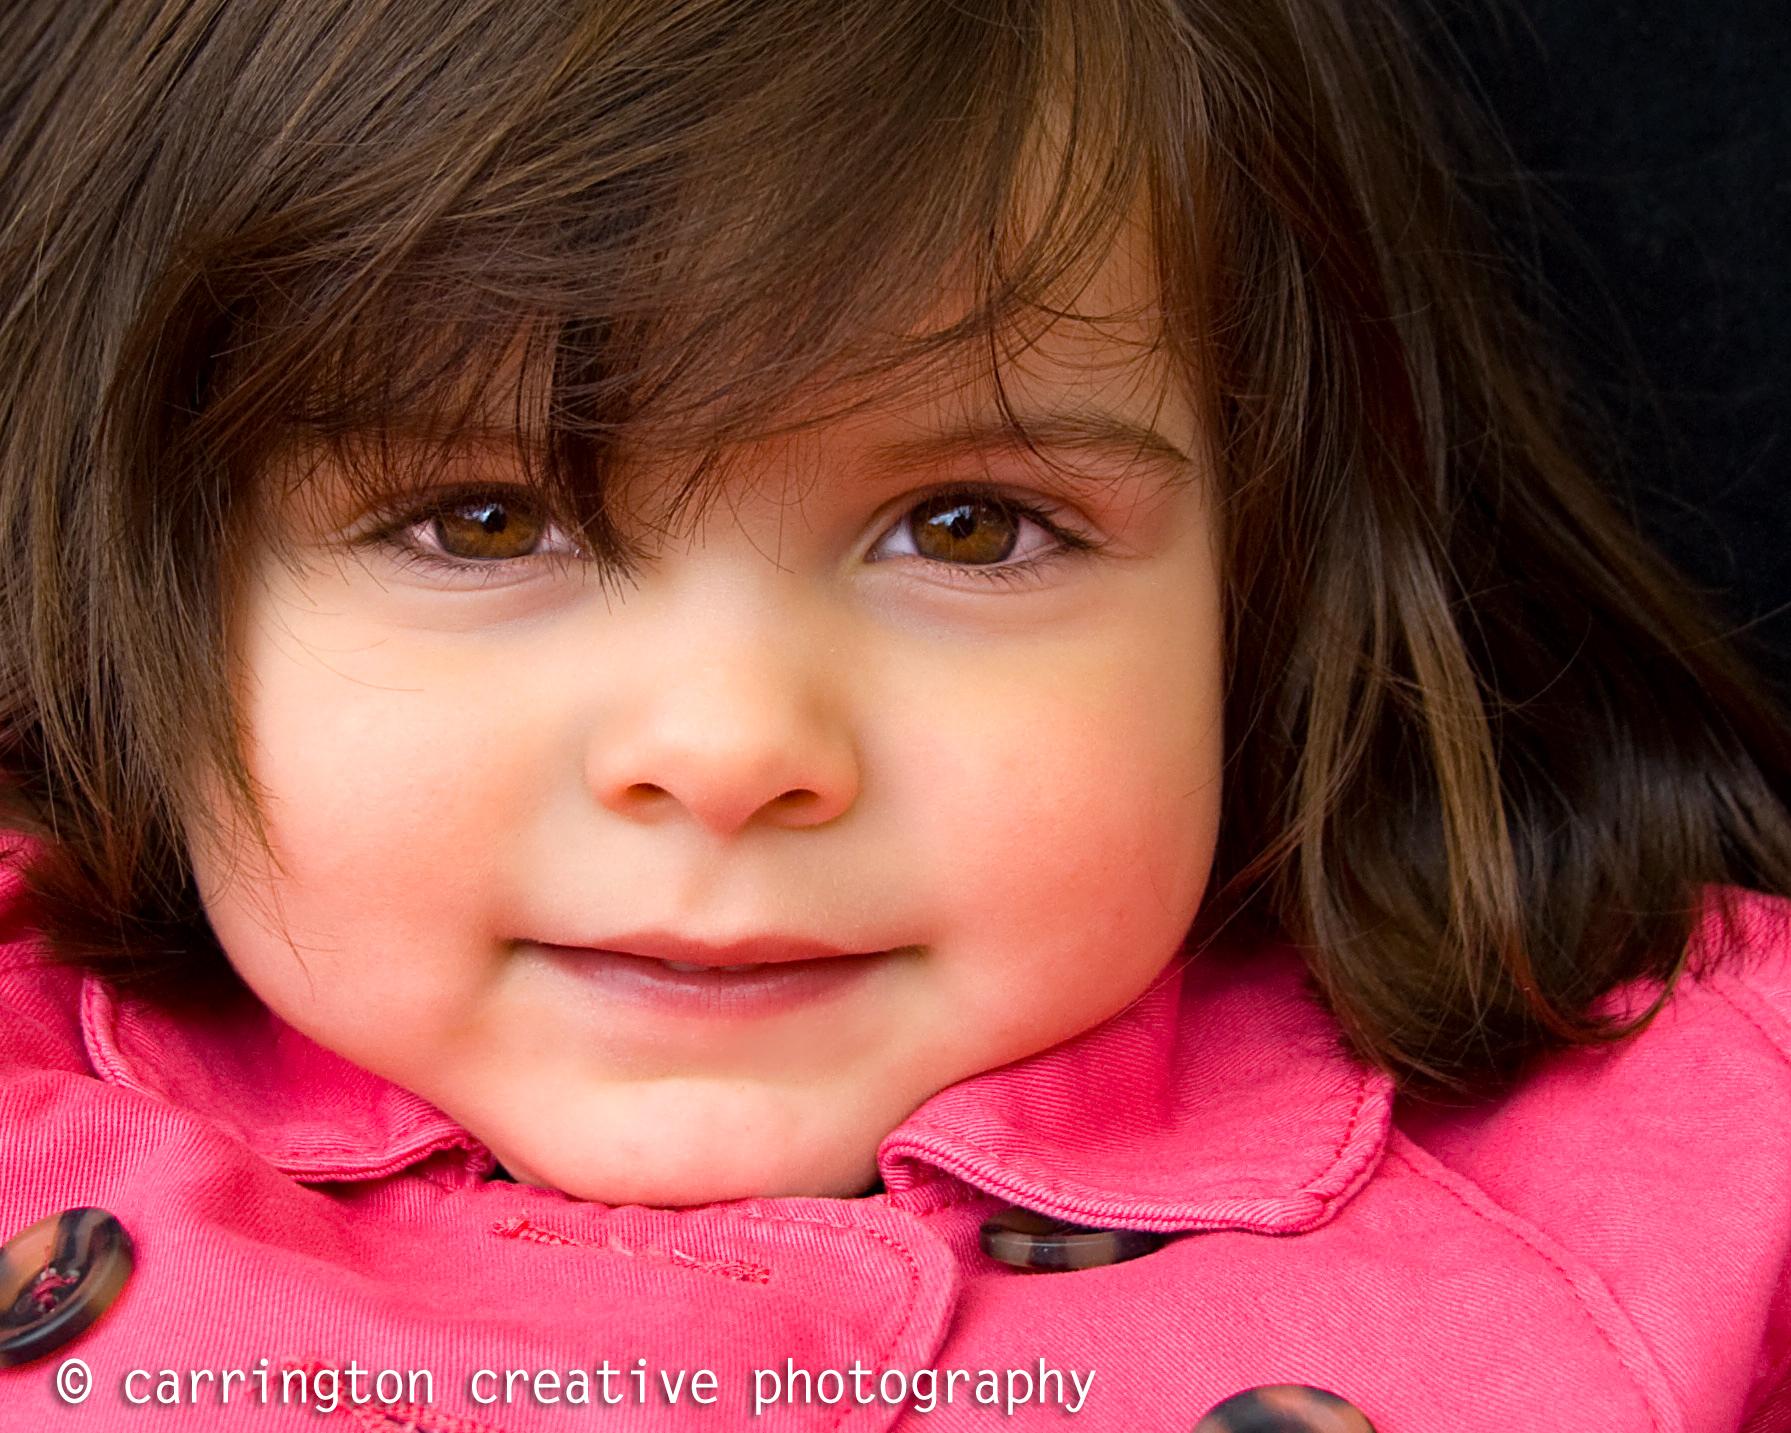 Portraiture Carrington Creative Photography Blog